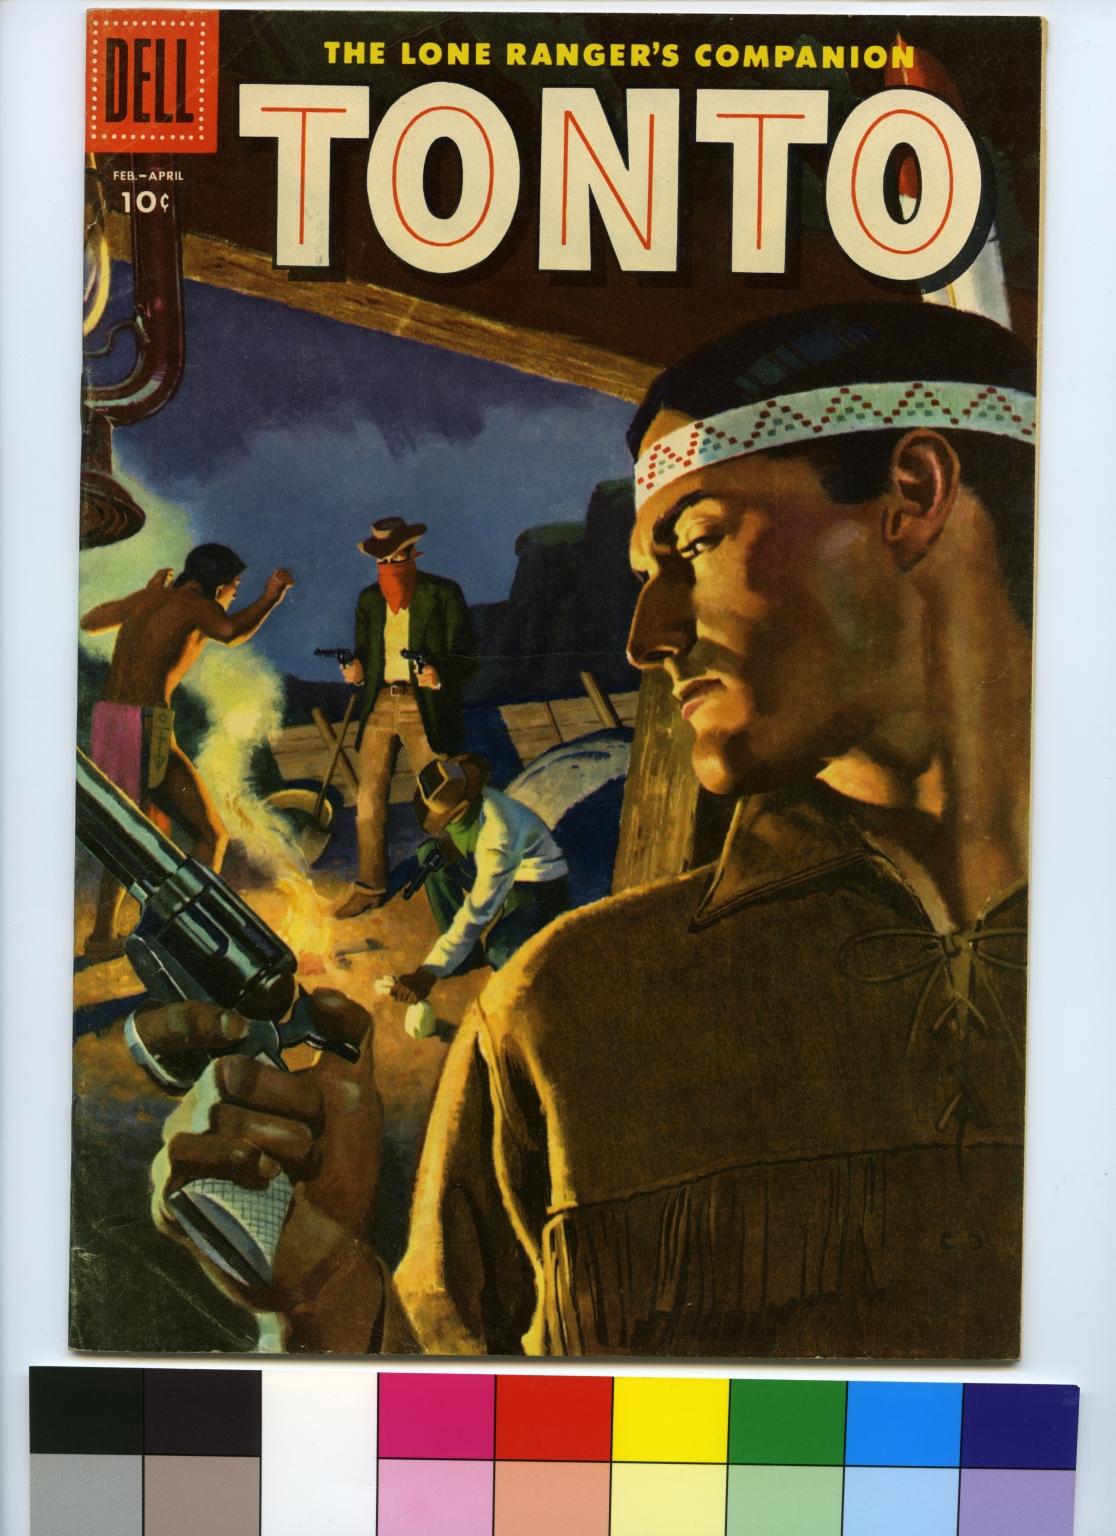 Lone Ranger's Companion Tonto, The